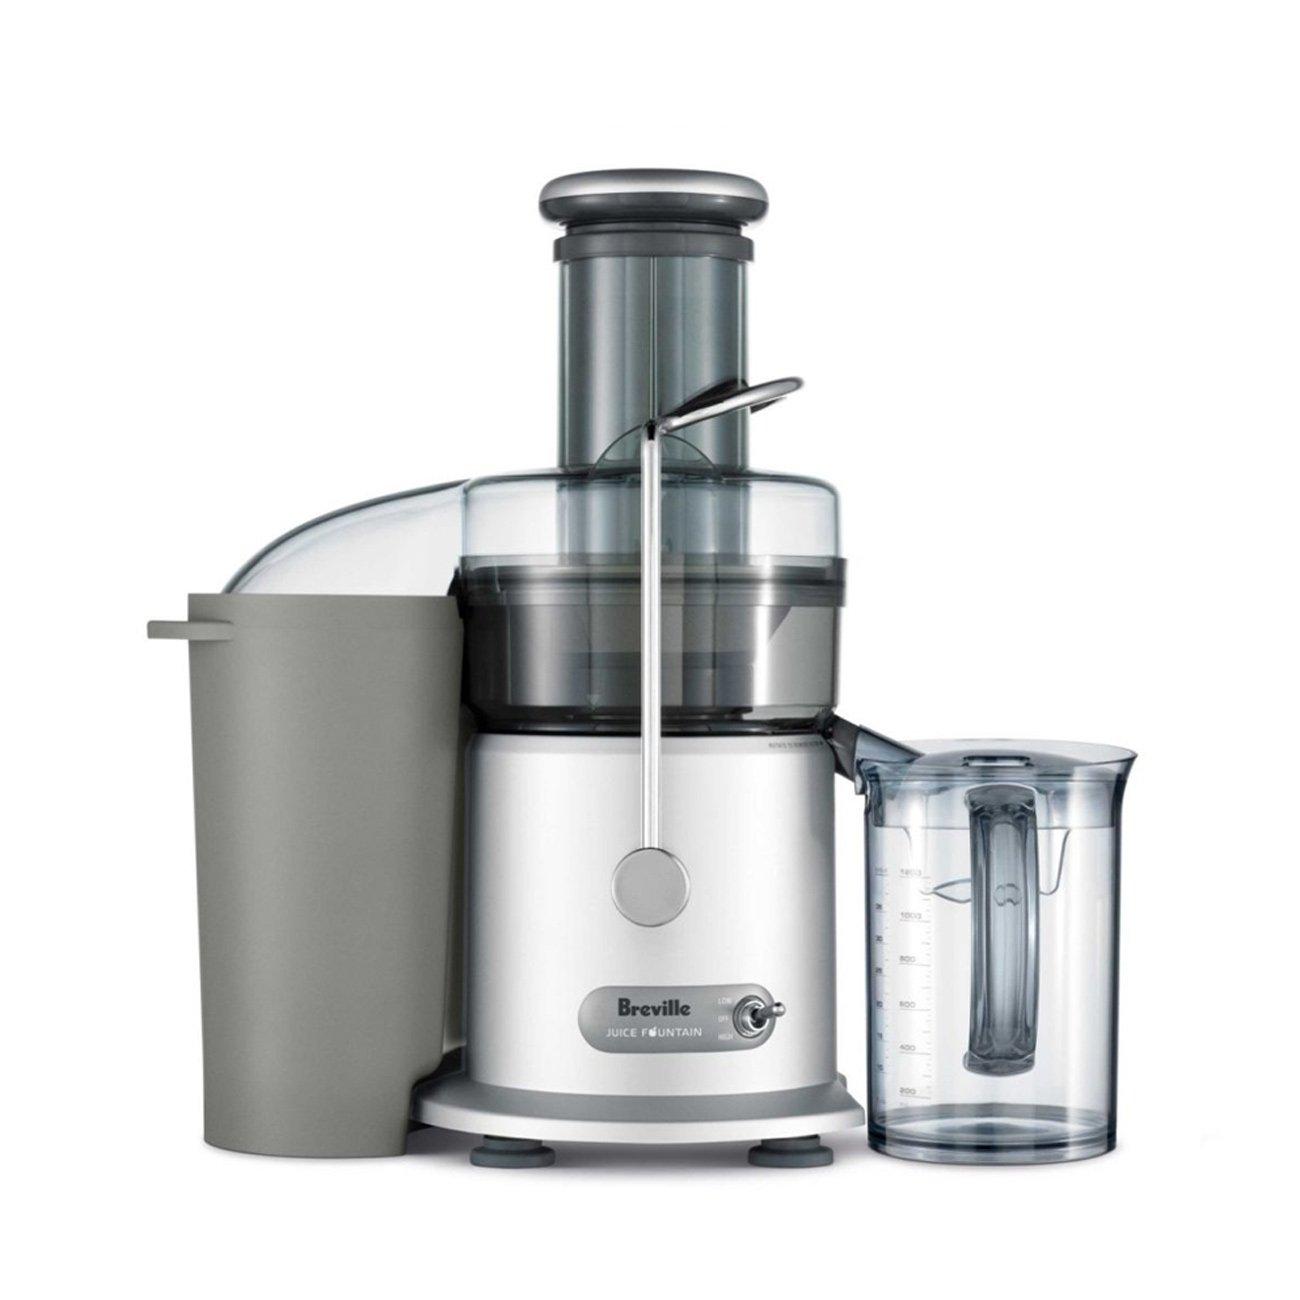 Breville the Juice Fountain Plus Blender